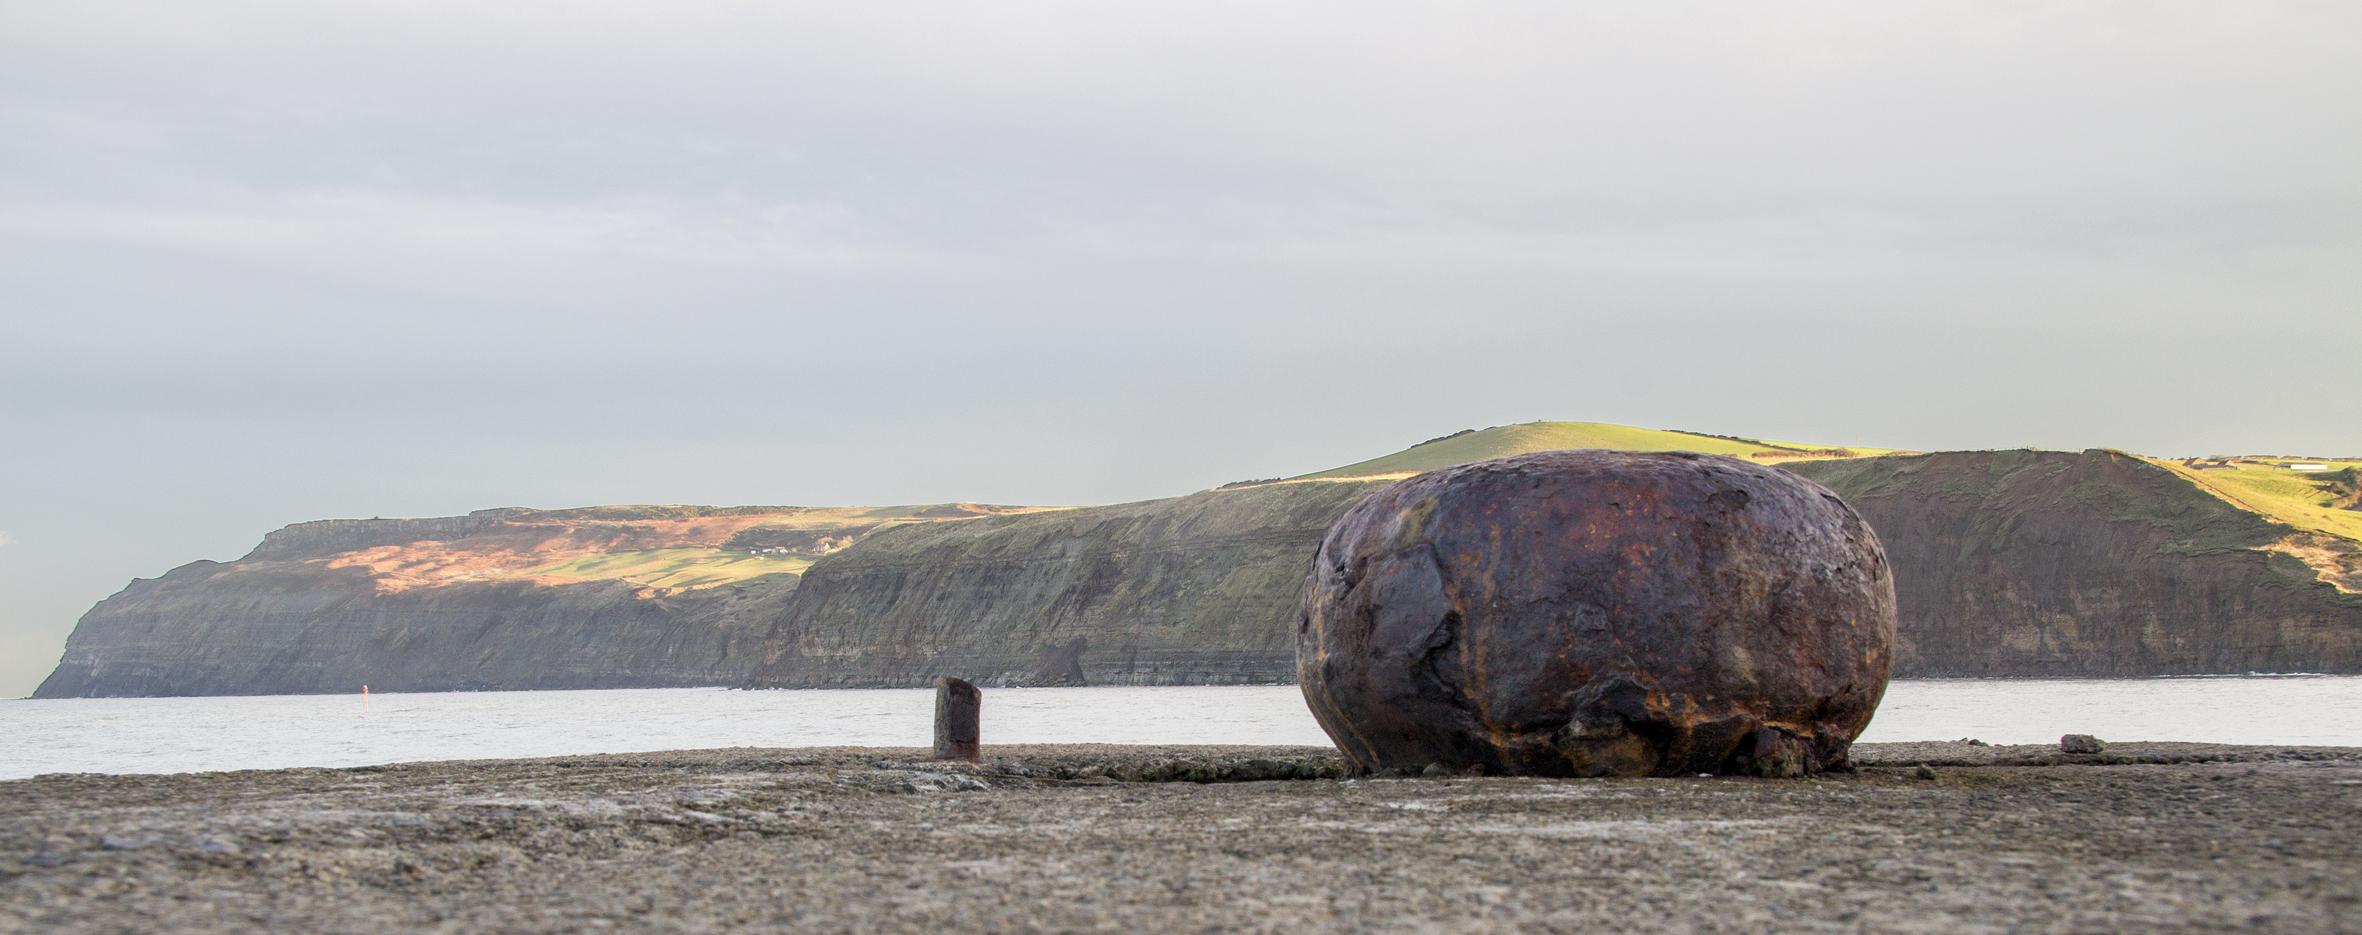 Skinningrove - late sunlight on the cliffs